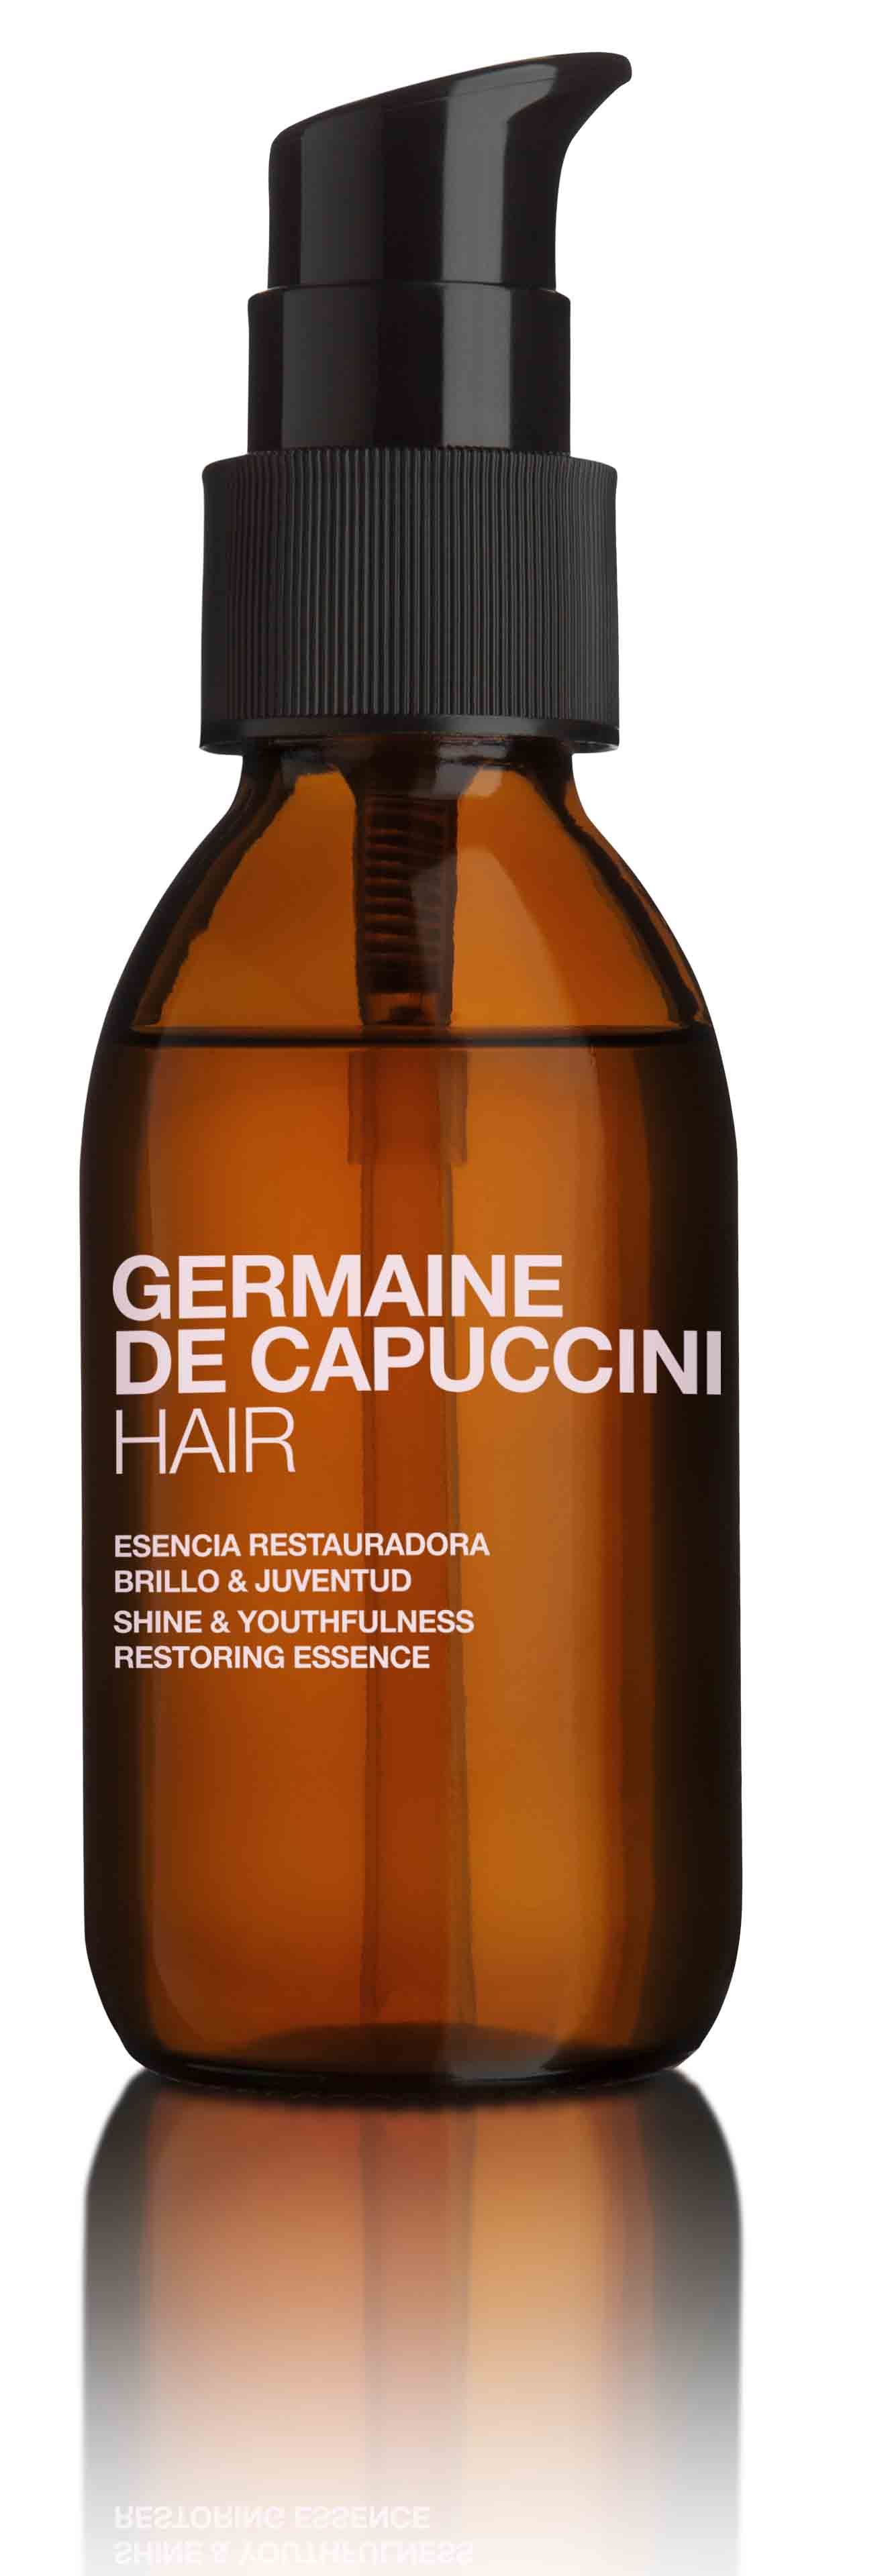 Hair_Germaine_de_Capuccini